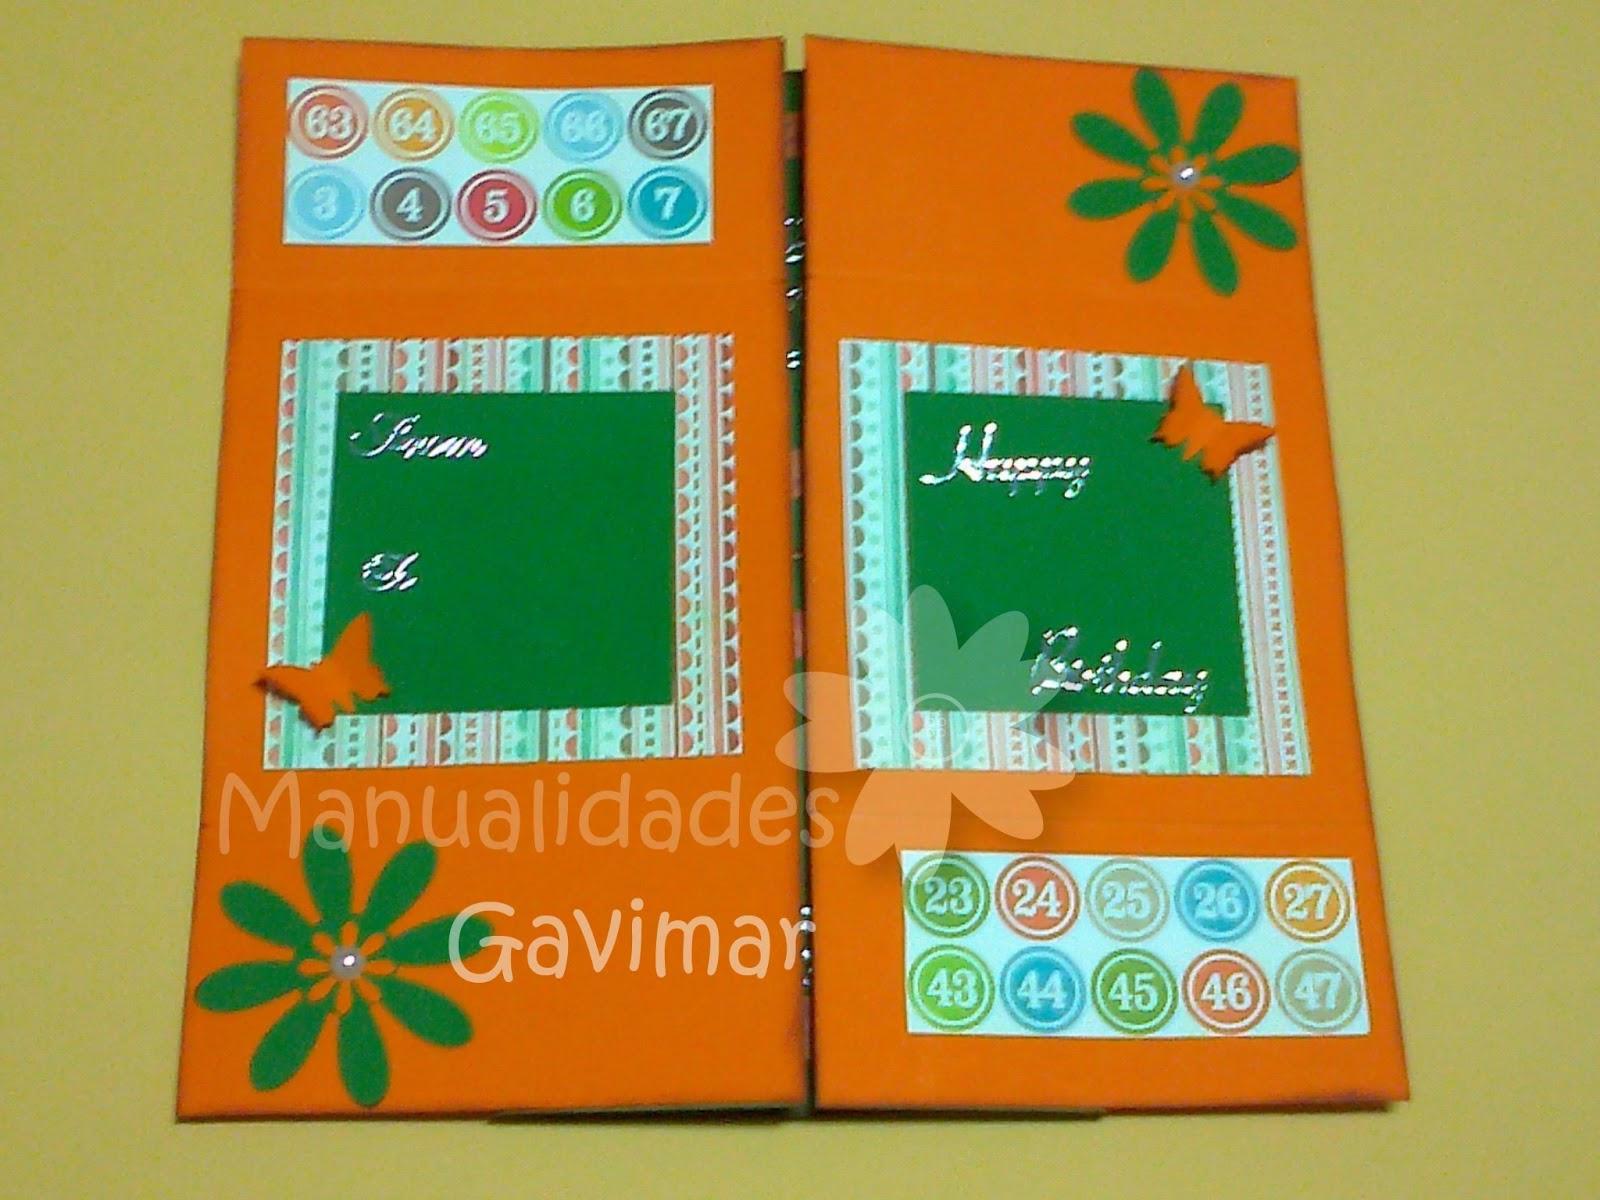 Manualidades gavimar tarjeta infinita - Manualidades para un amigo invisible ...